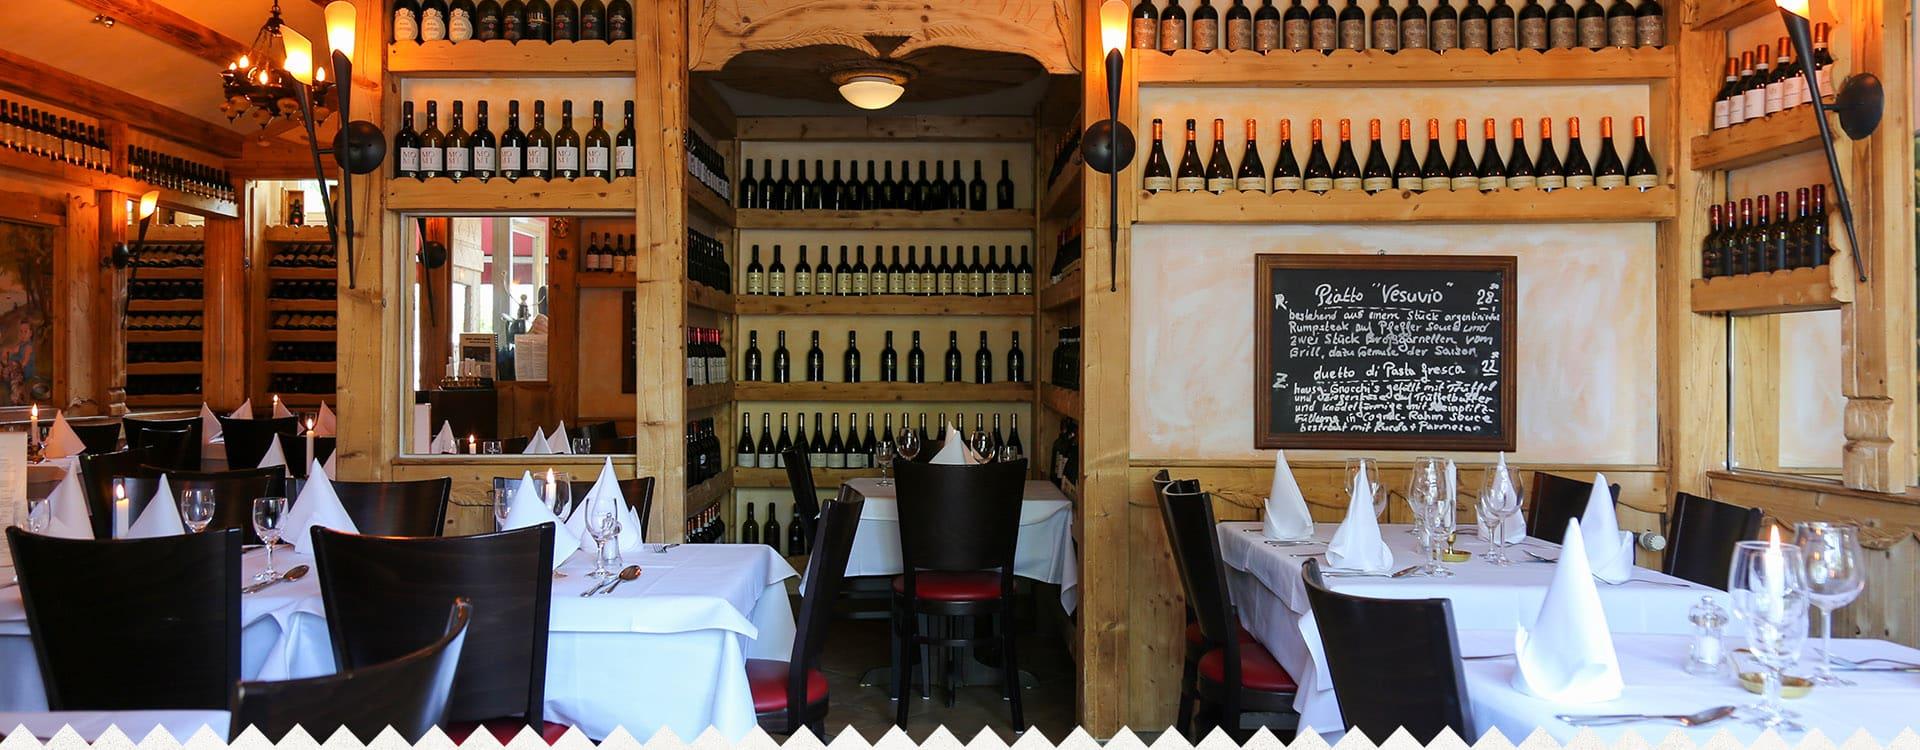 ristorante-vesuvio-berlin-slider-1920x750-3